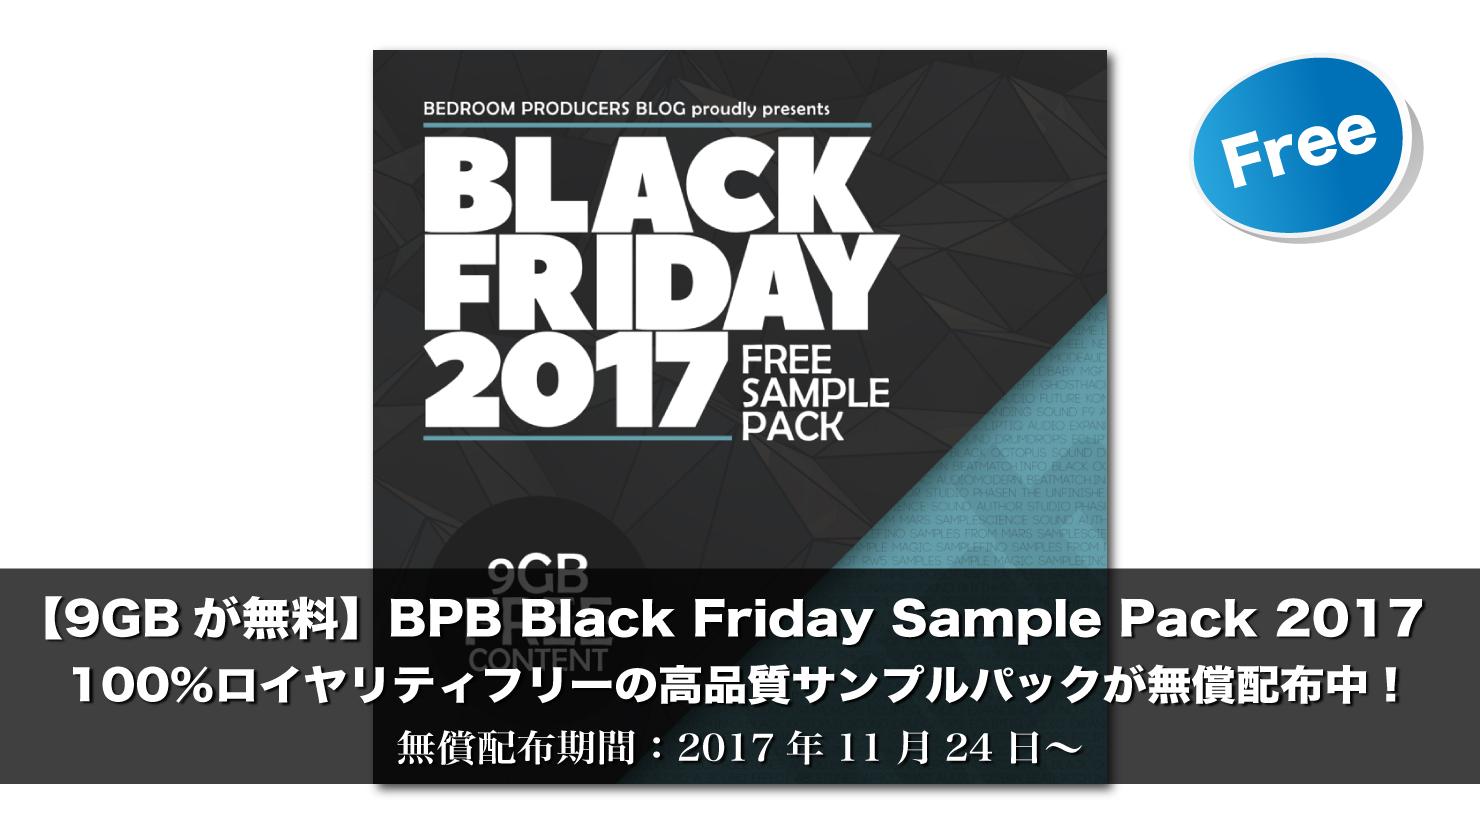 【9GBが無料】高品質サンプルパック BPB Black Friday Sample Pack 2017 無償配布中!